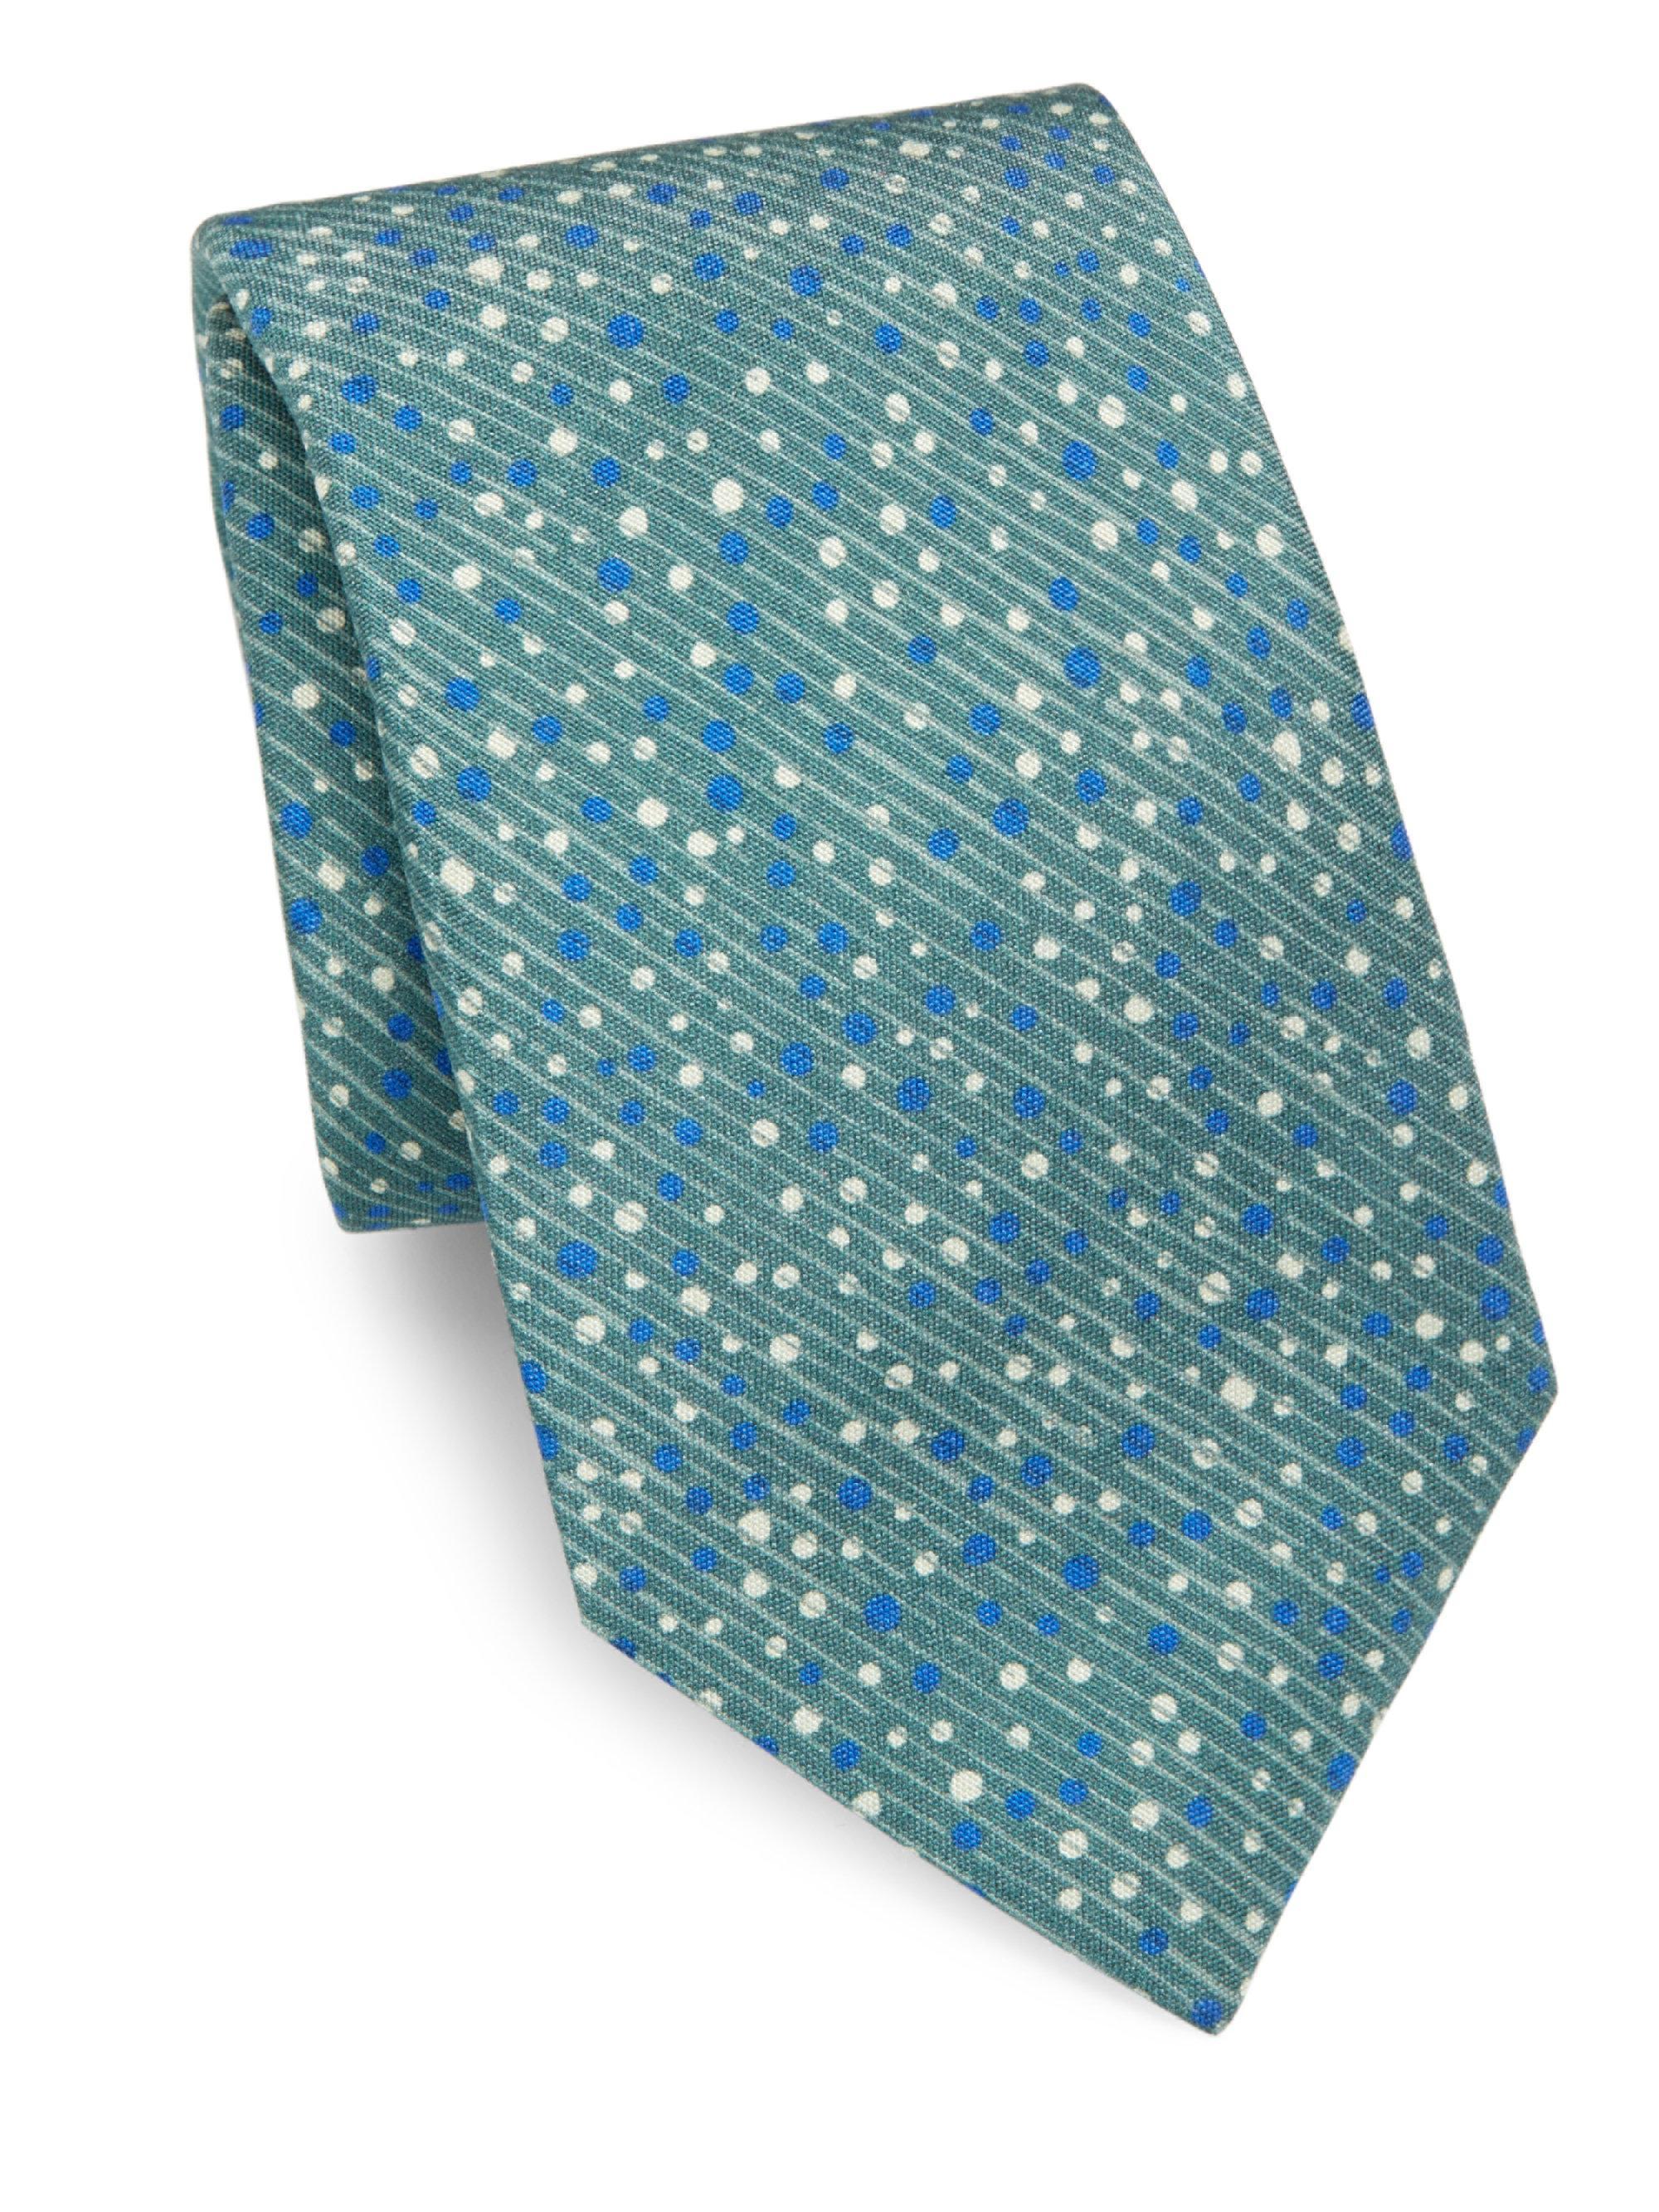 Mens Geometric-Print Silk Necktie Isaia xLQGo